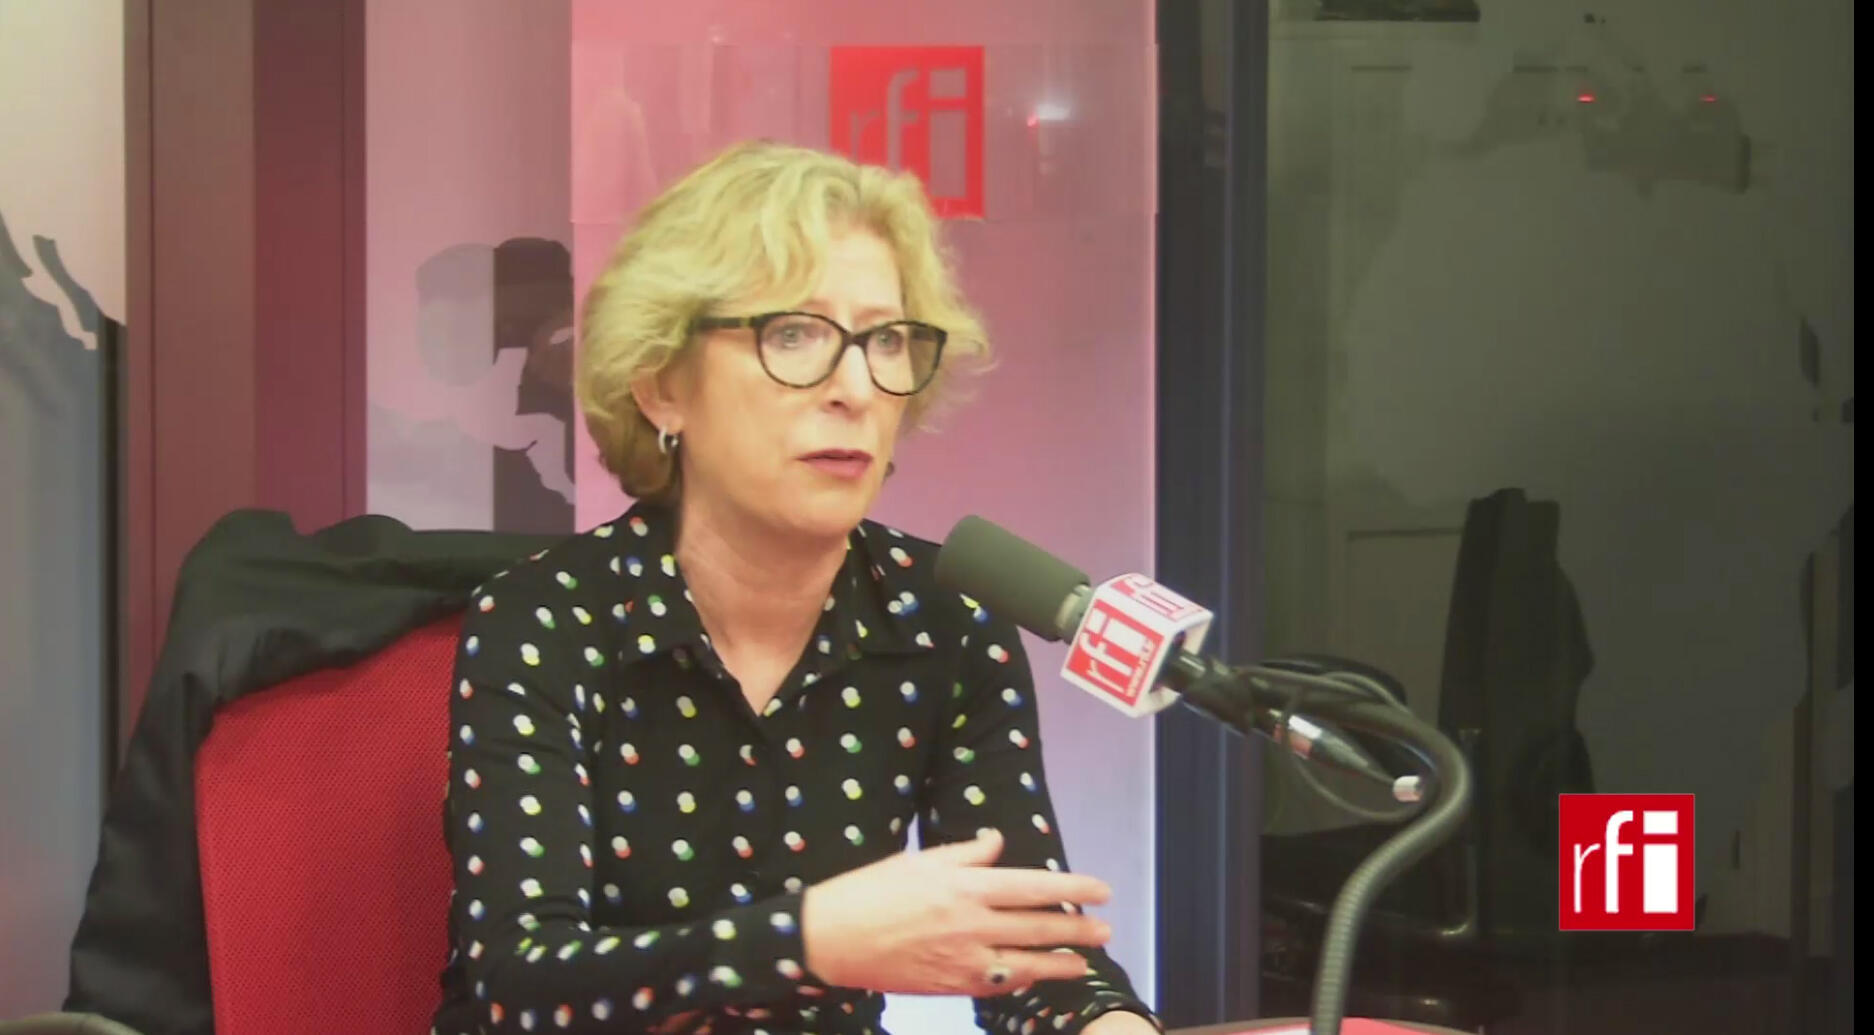 French Higher Education Minister Geneviève Fioraso